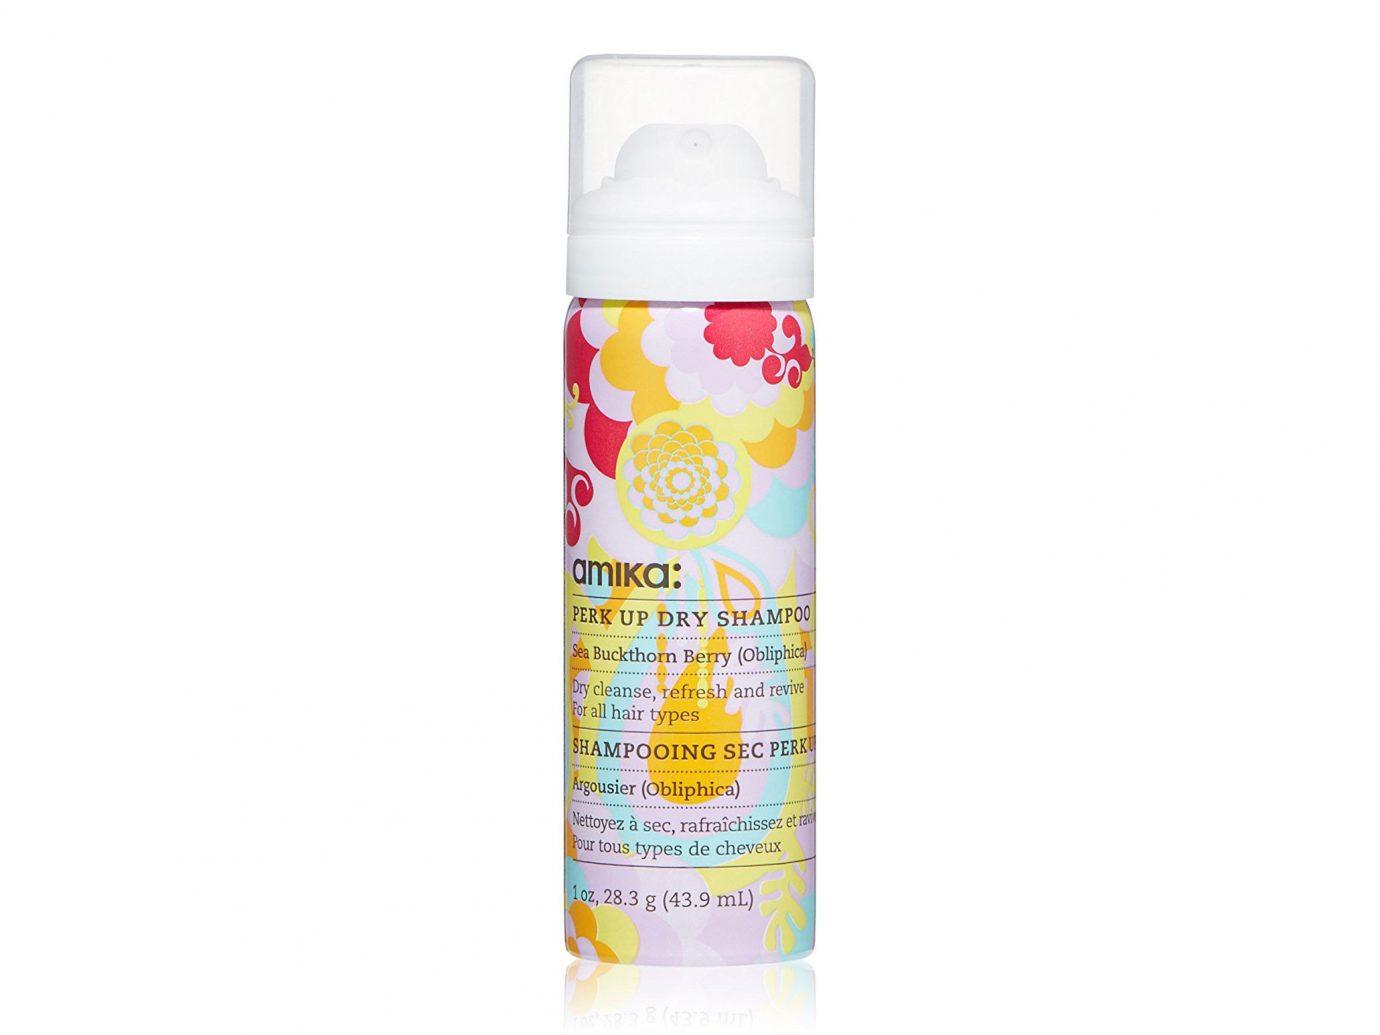 Beauty Travel Shop product spray lotion liquid skin care